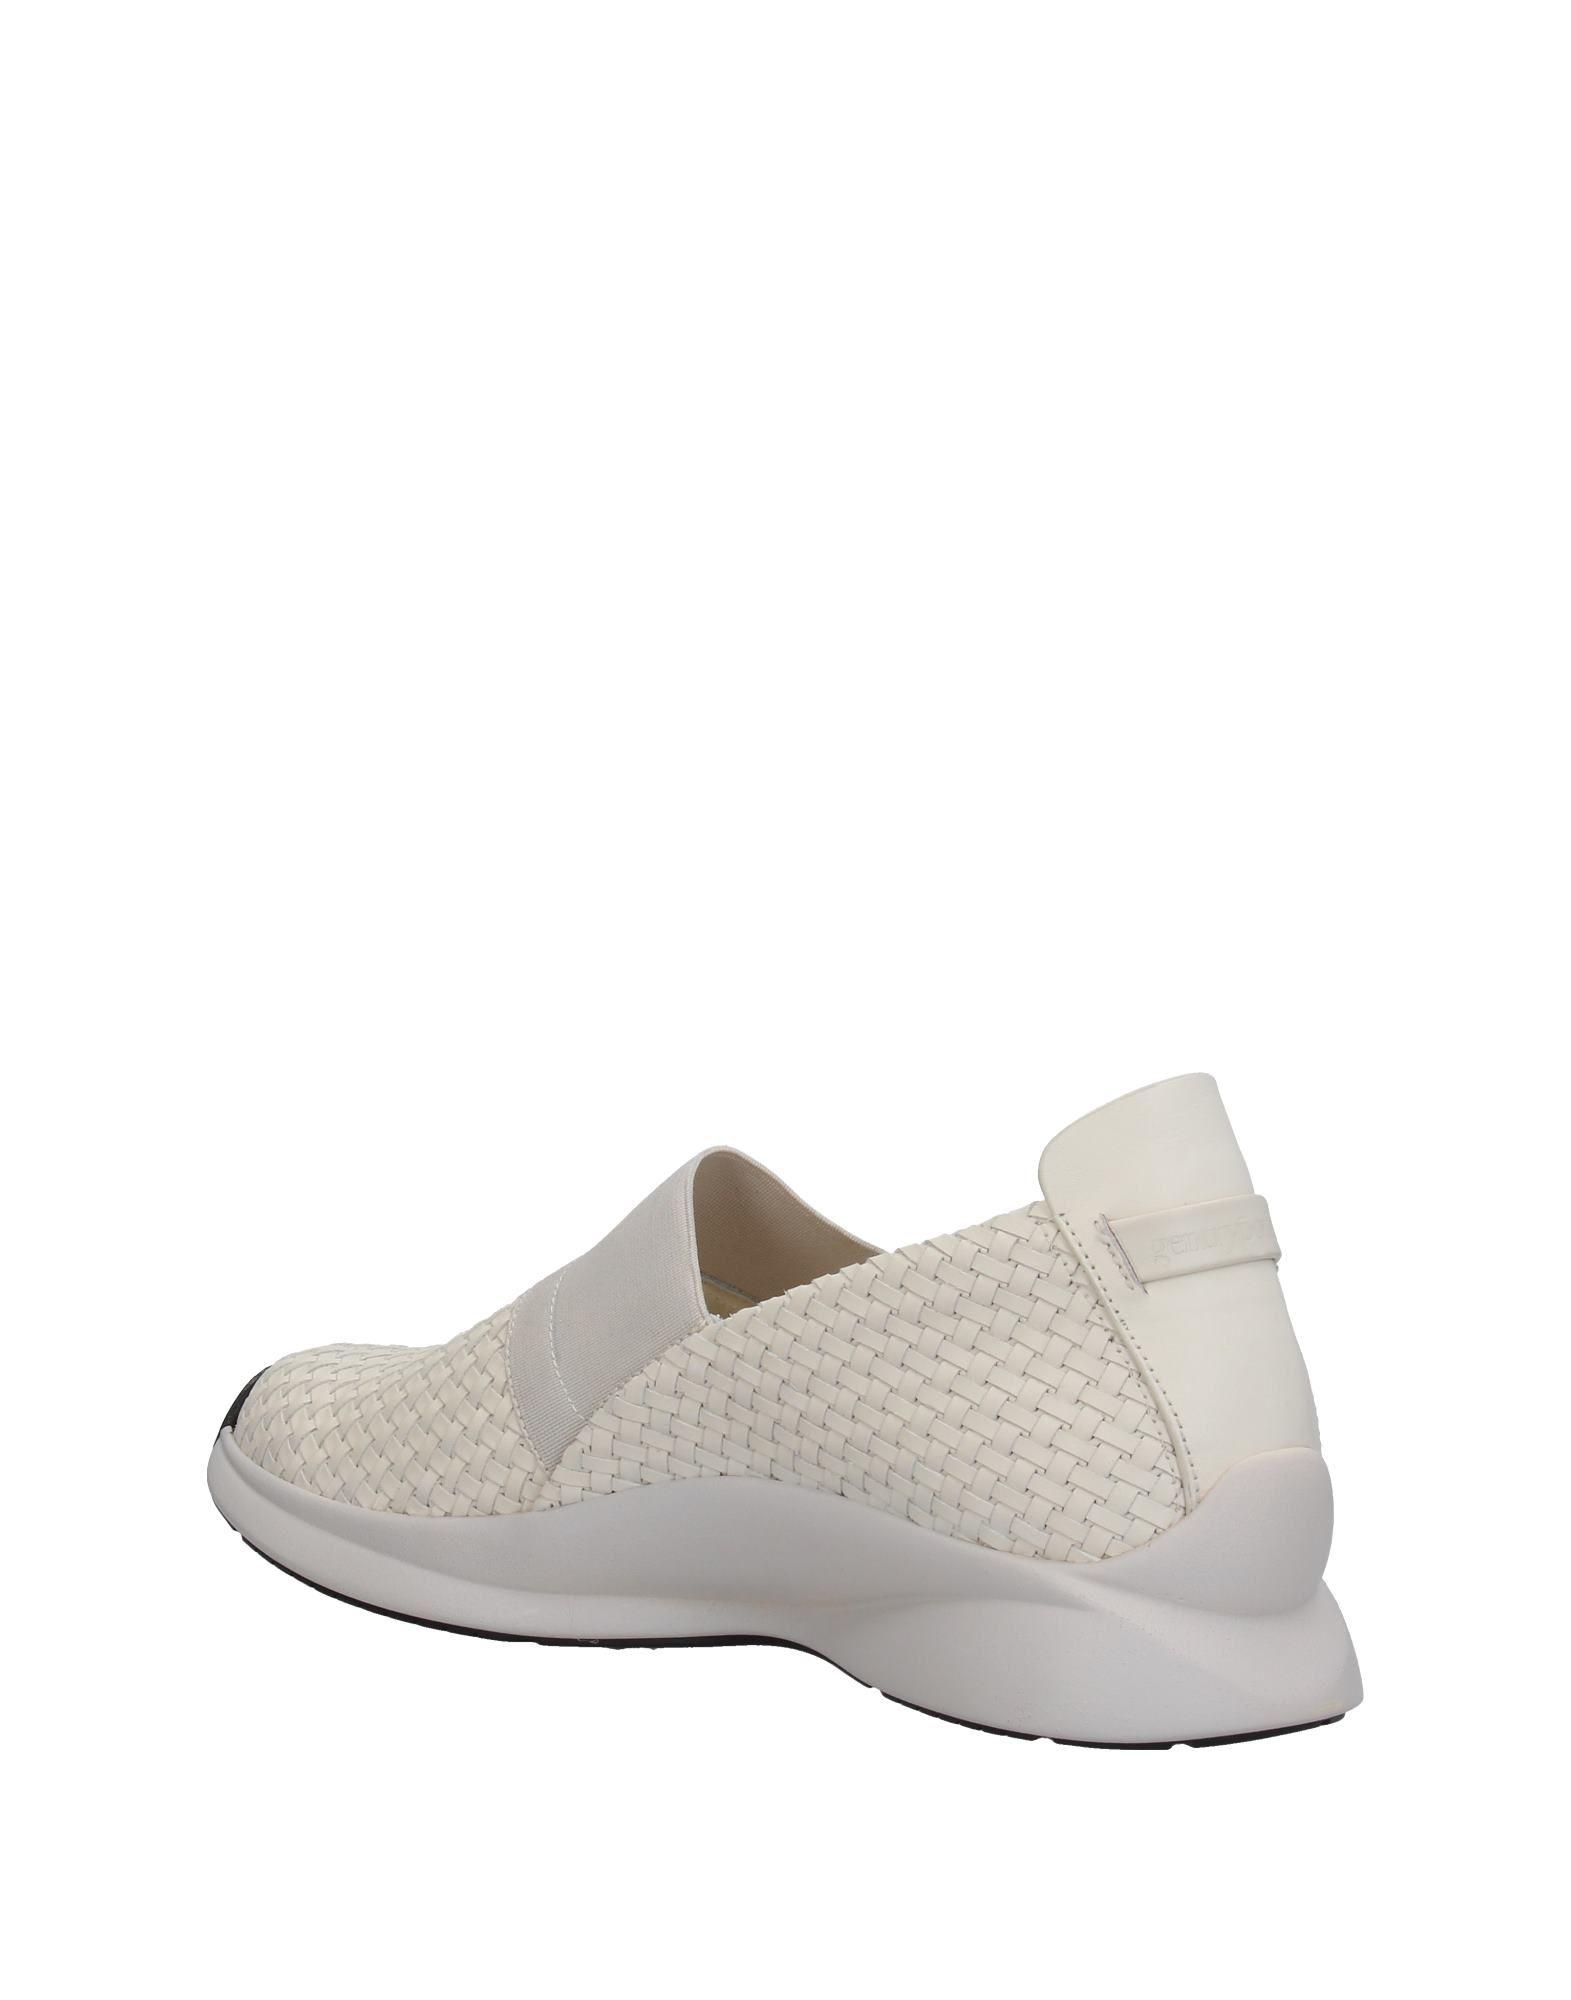 Sneakers Gentryportofino Femme - Sneakers Gentryportofino sur